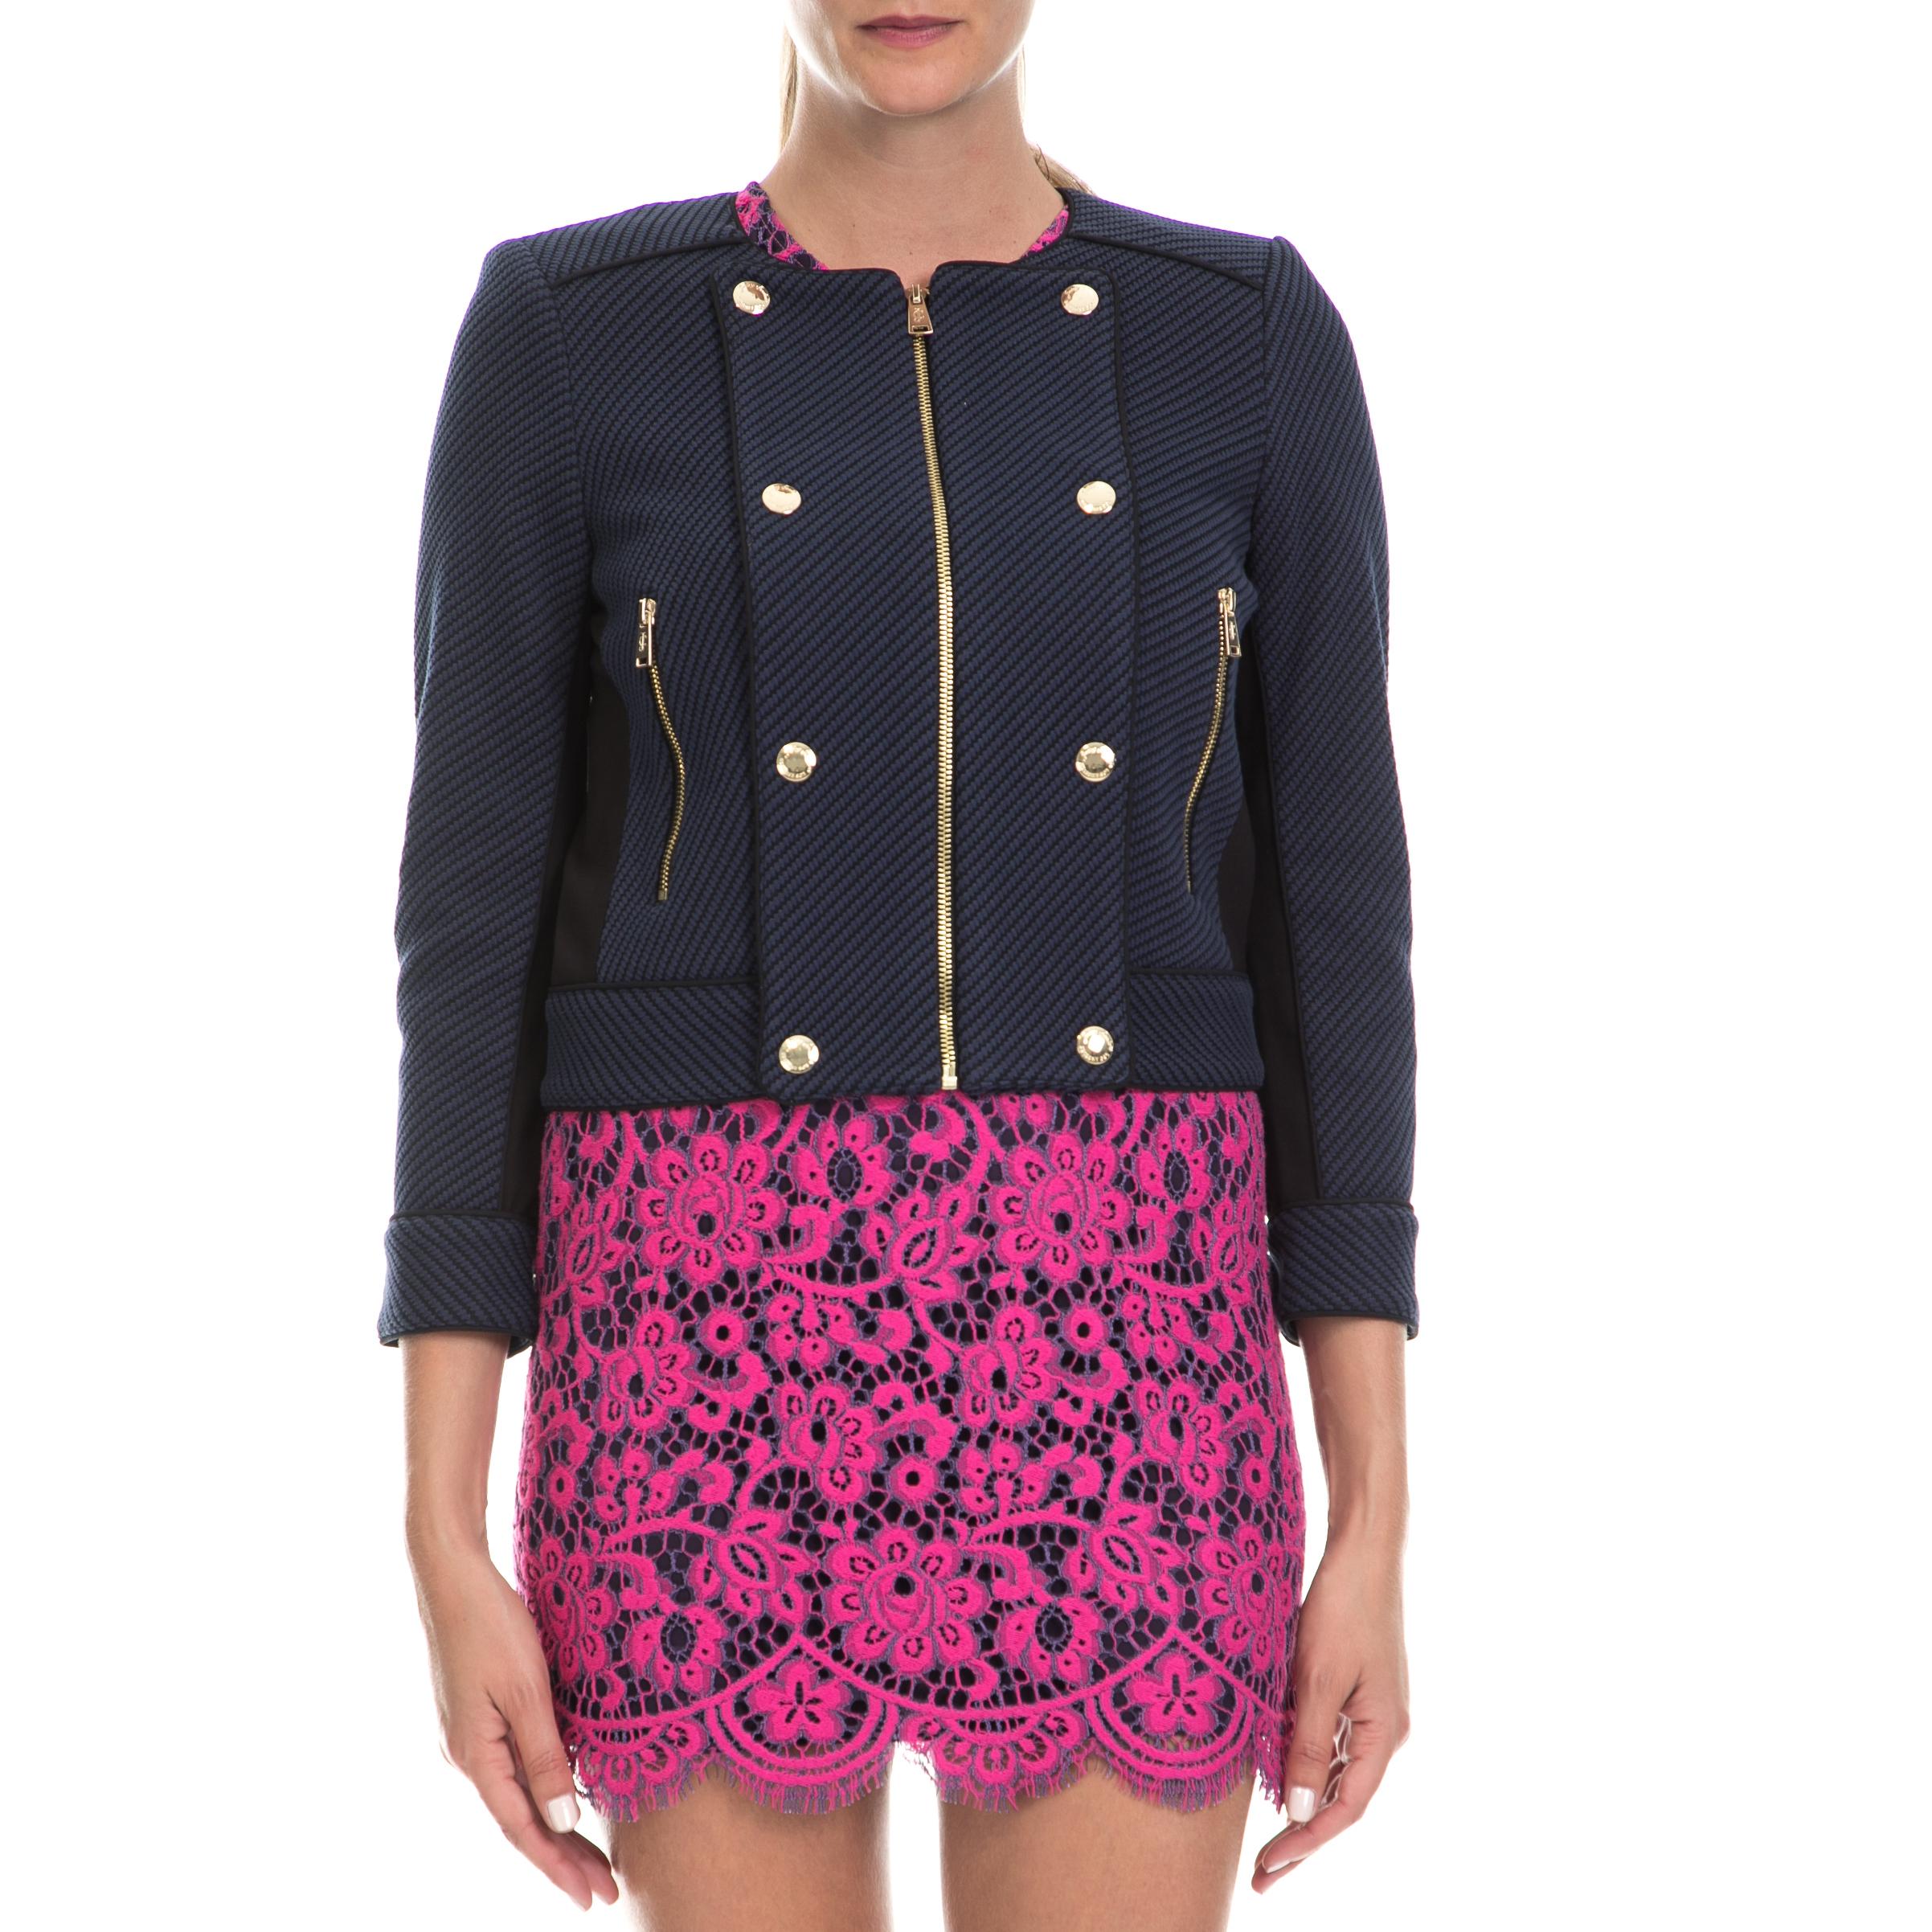 JUICY COUTURE - Γυναικείο σακάκι JUICY COUTURE μπλε γυναικεία ρούχα πανωφόρια σακάκια